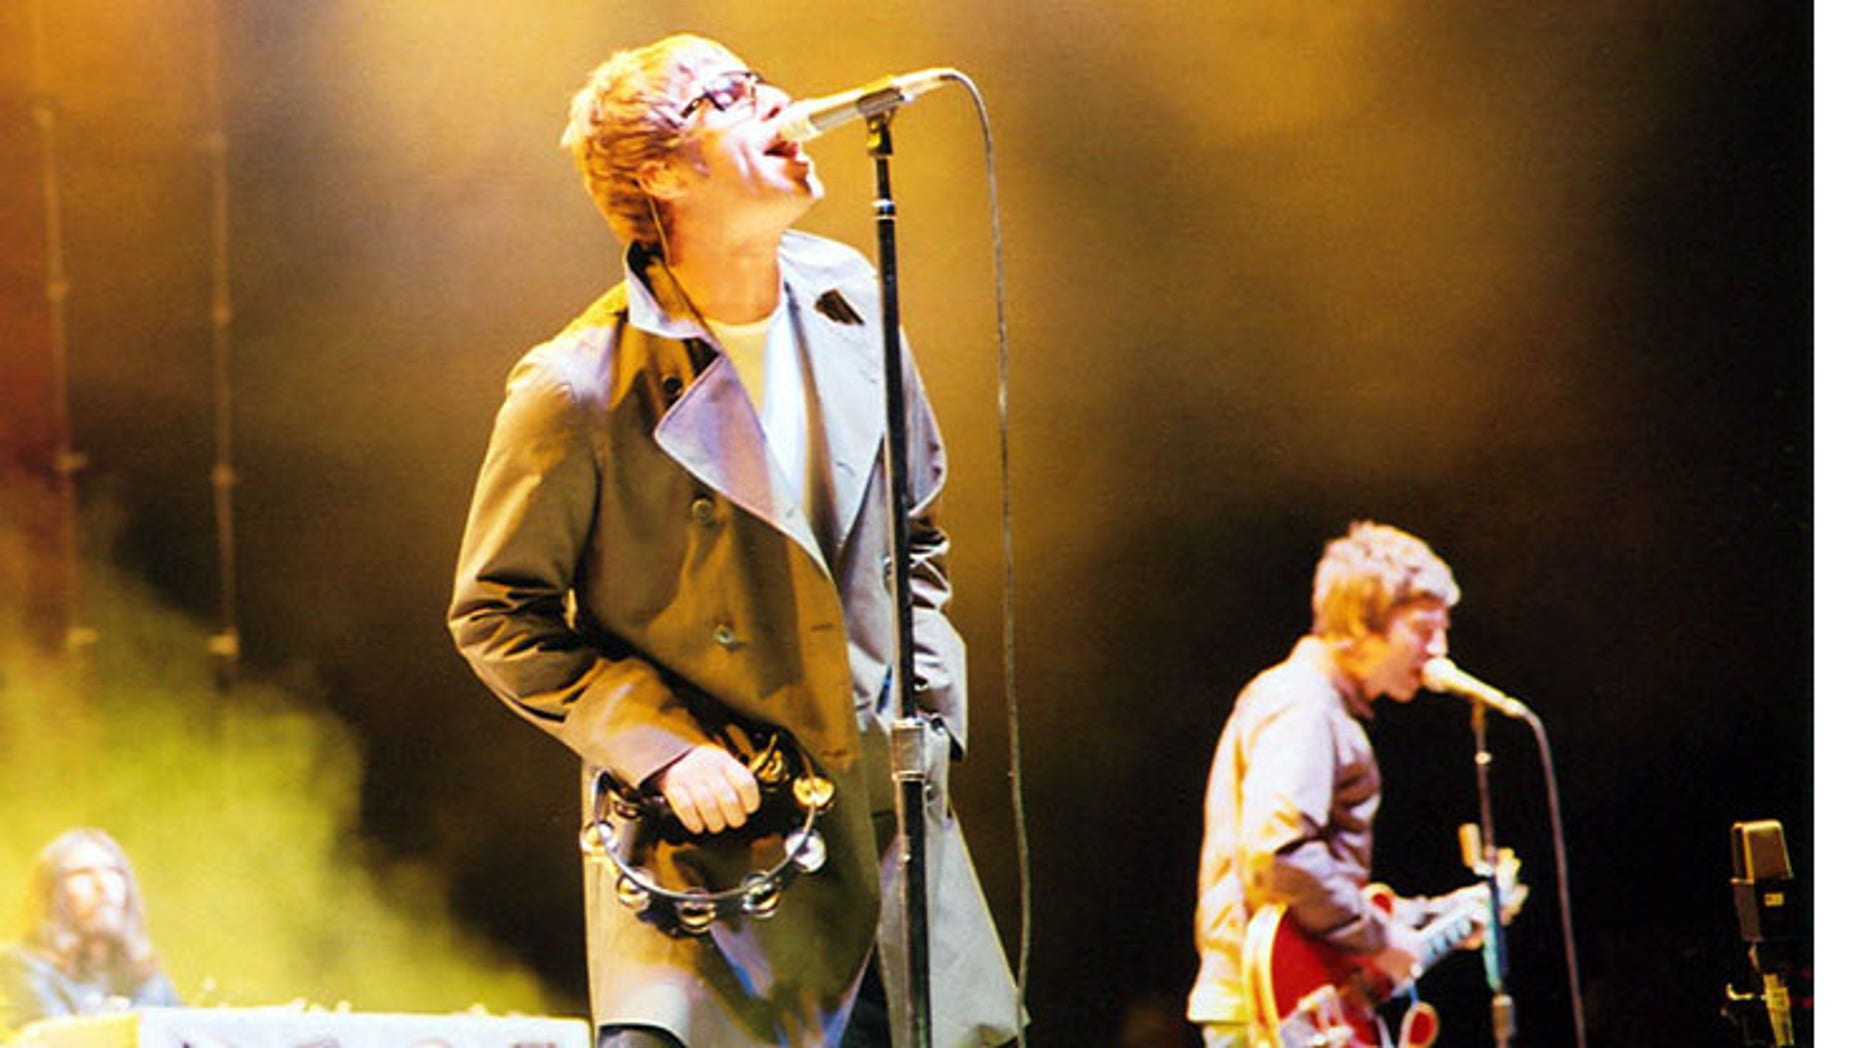 Vocalist Liam Gallagher, guitarist Noel Gallagher and, keyboardist Jay Darlington in background in 2005.